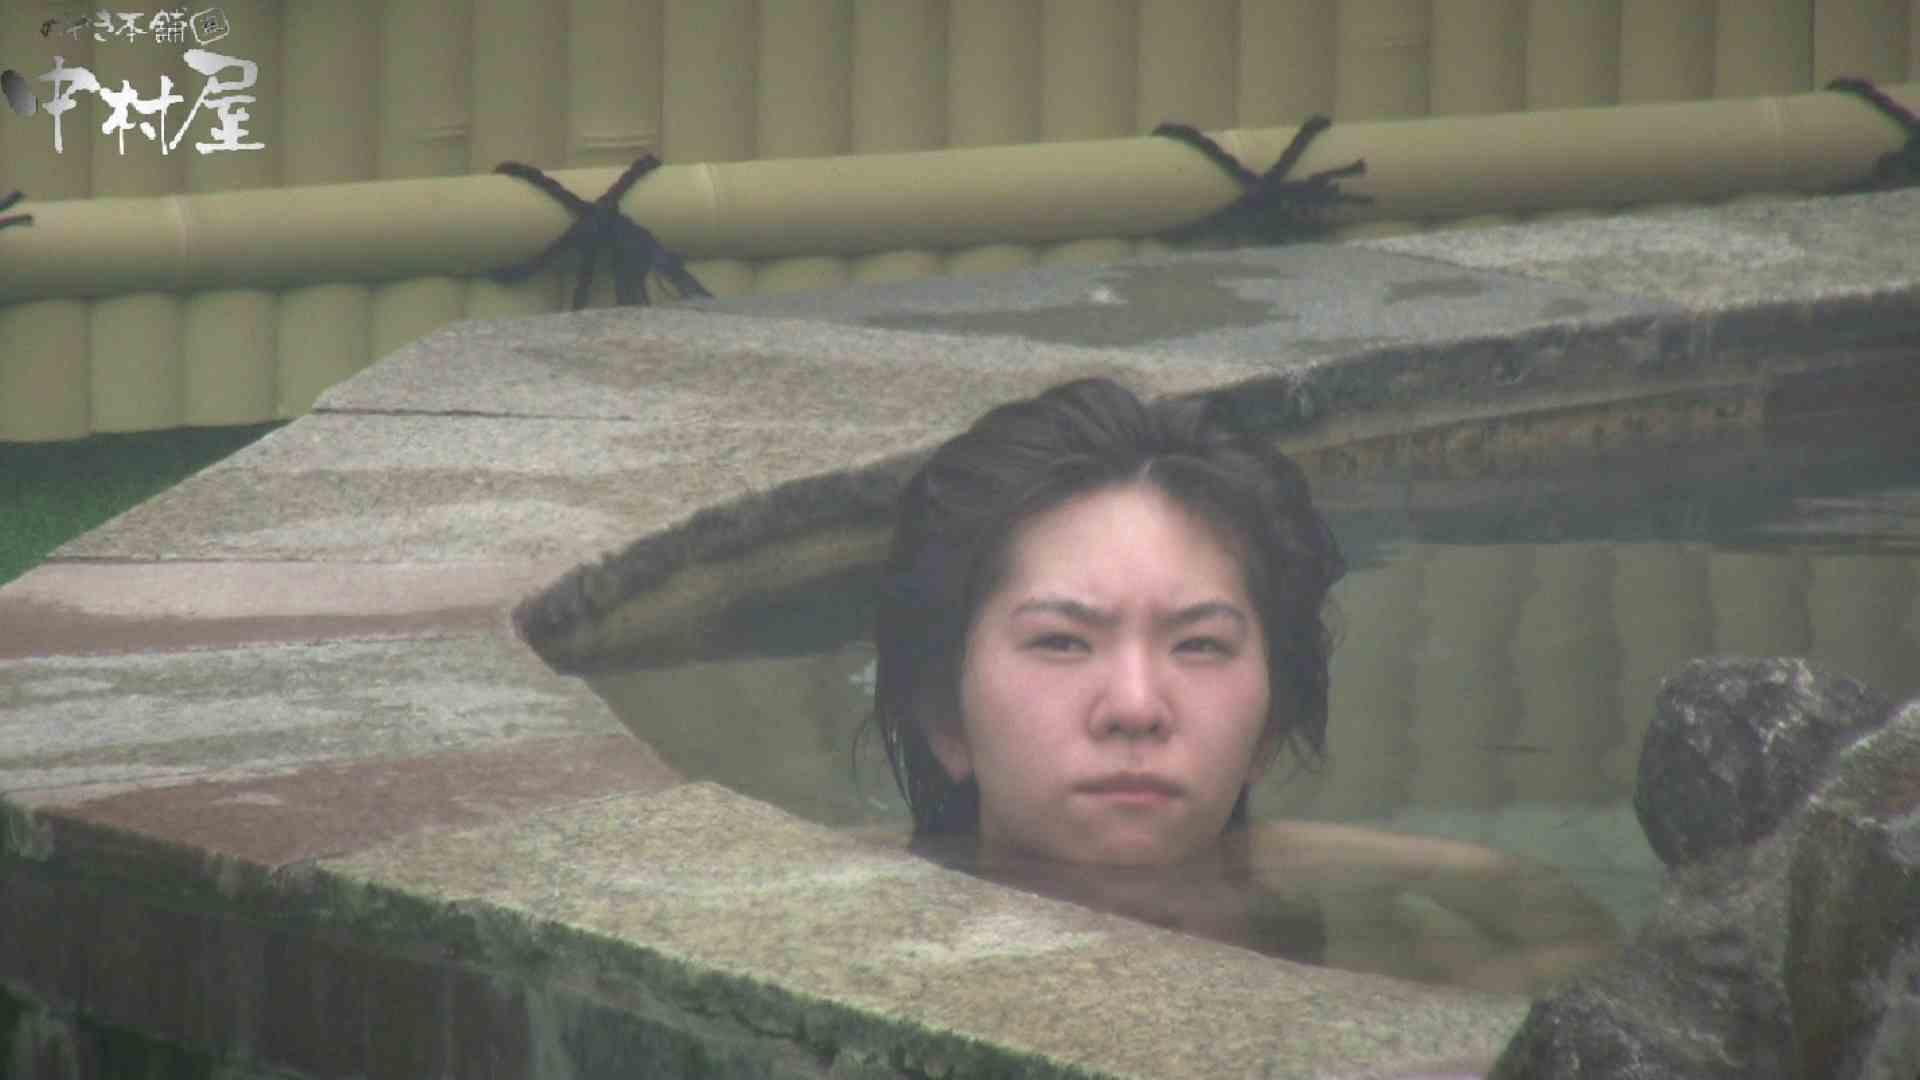 Aquaな露天風呂Vol.907 OL女体  95連発 12